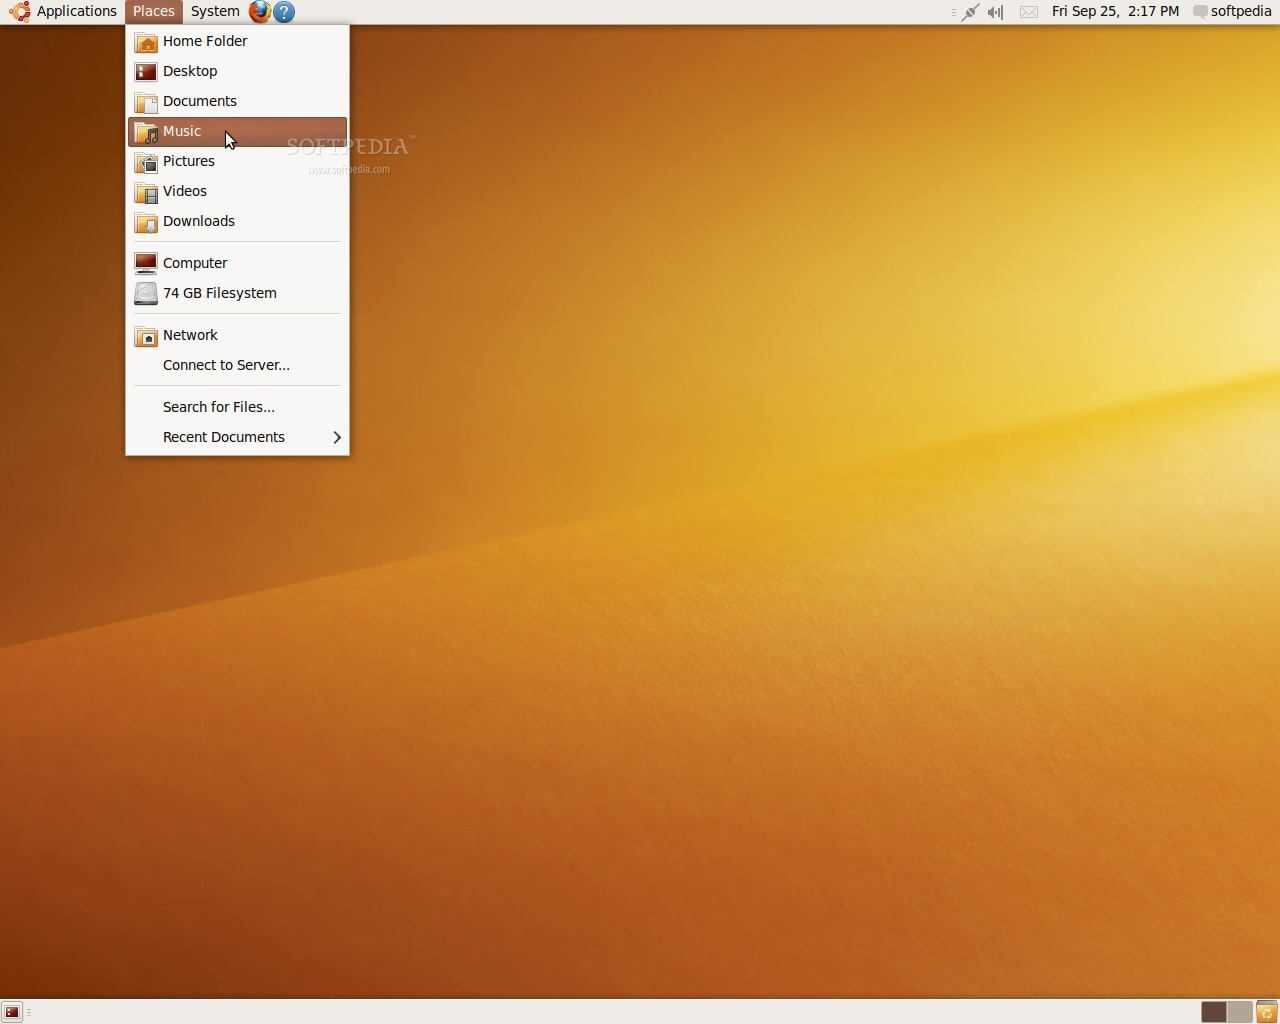 ubuntu server 9.10